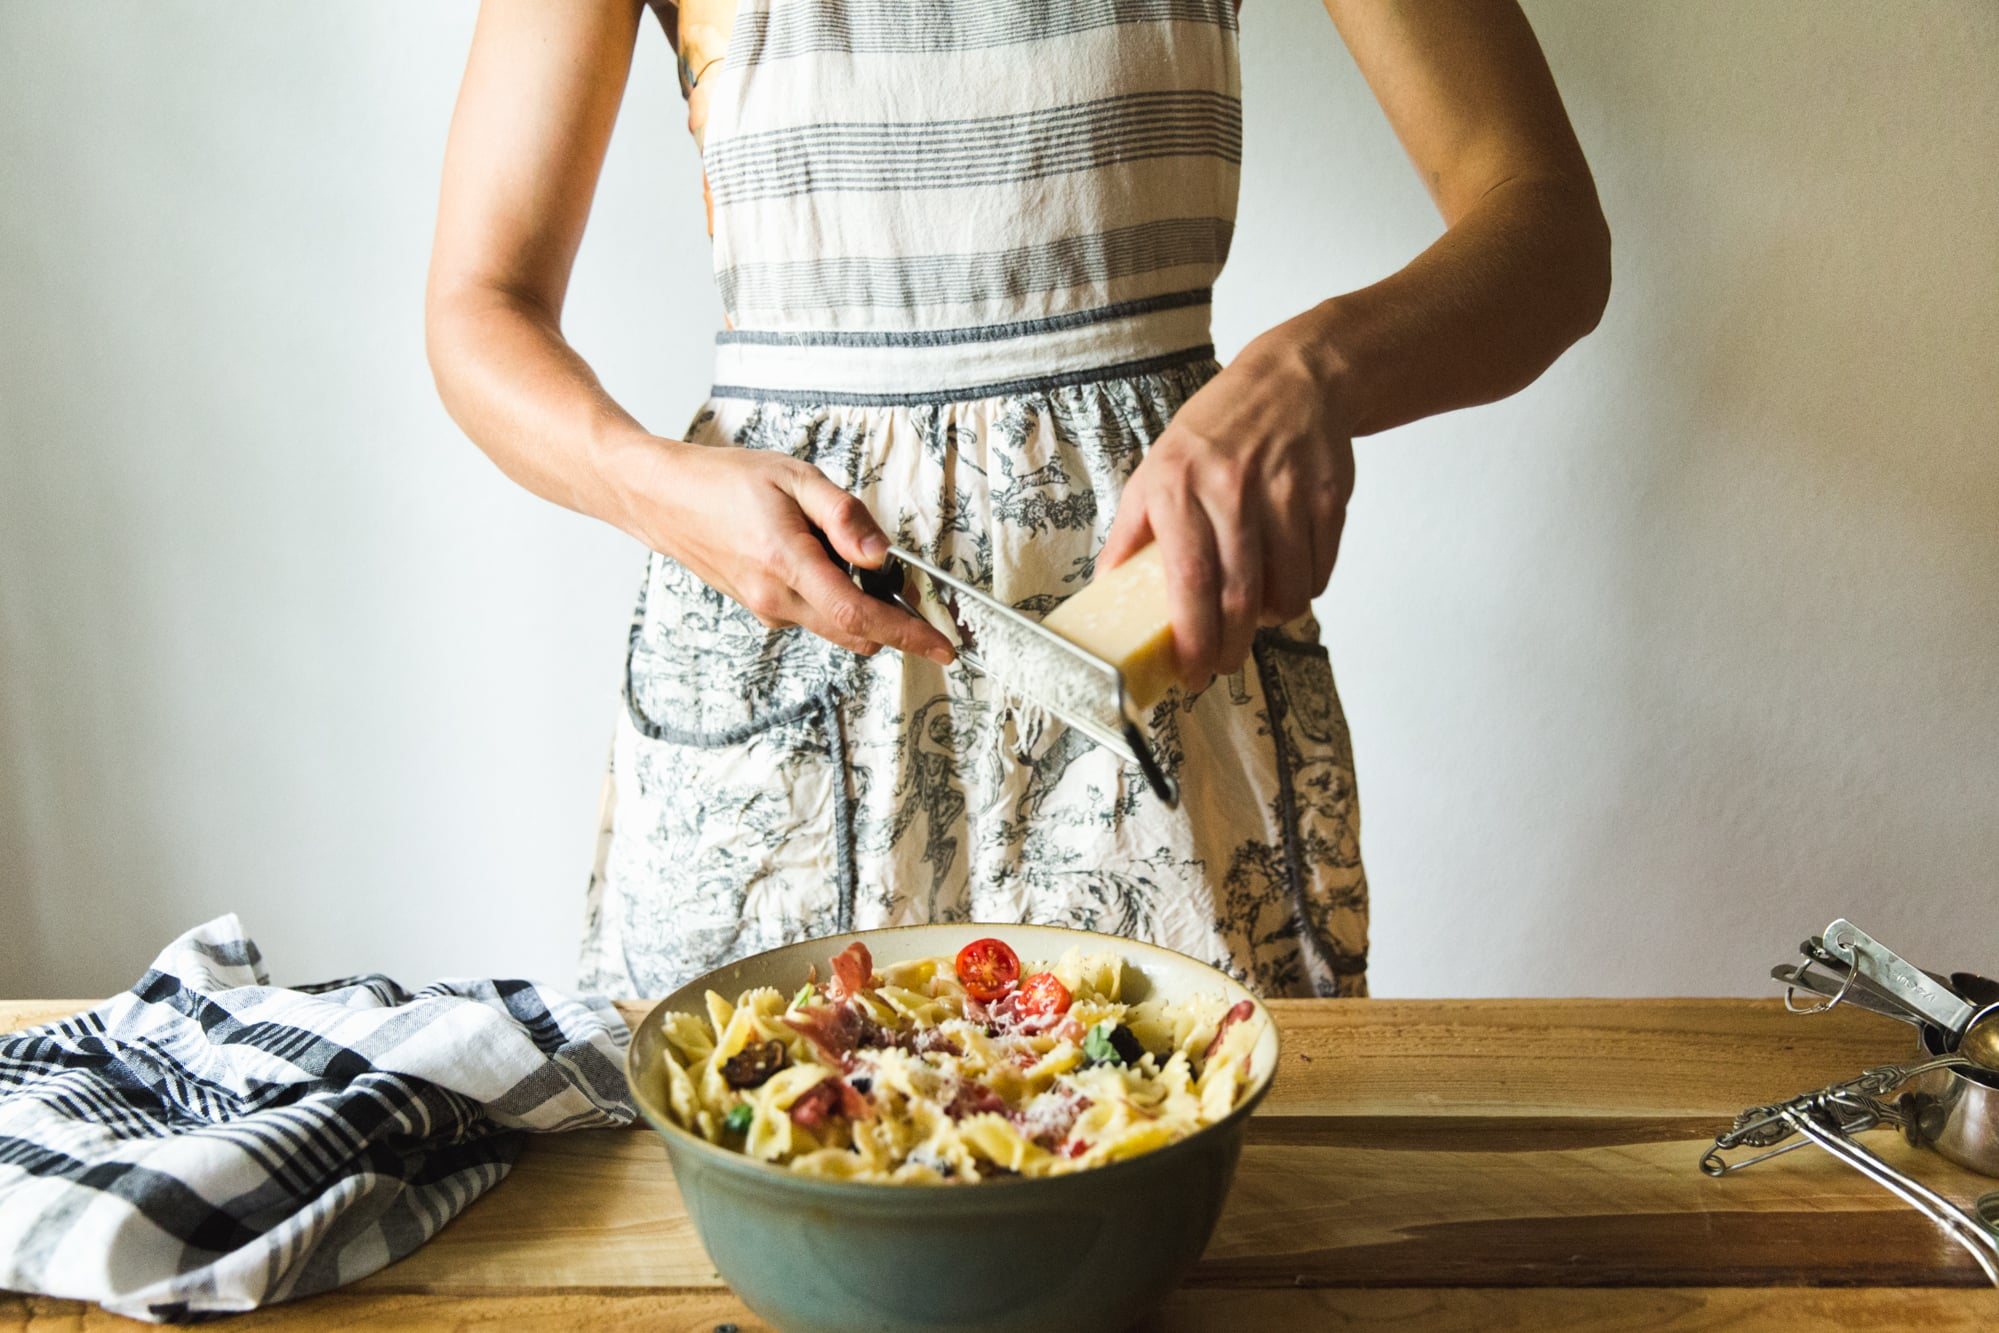 fig-prosciutto-pasta-salad-recipe-19.jpg